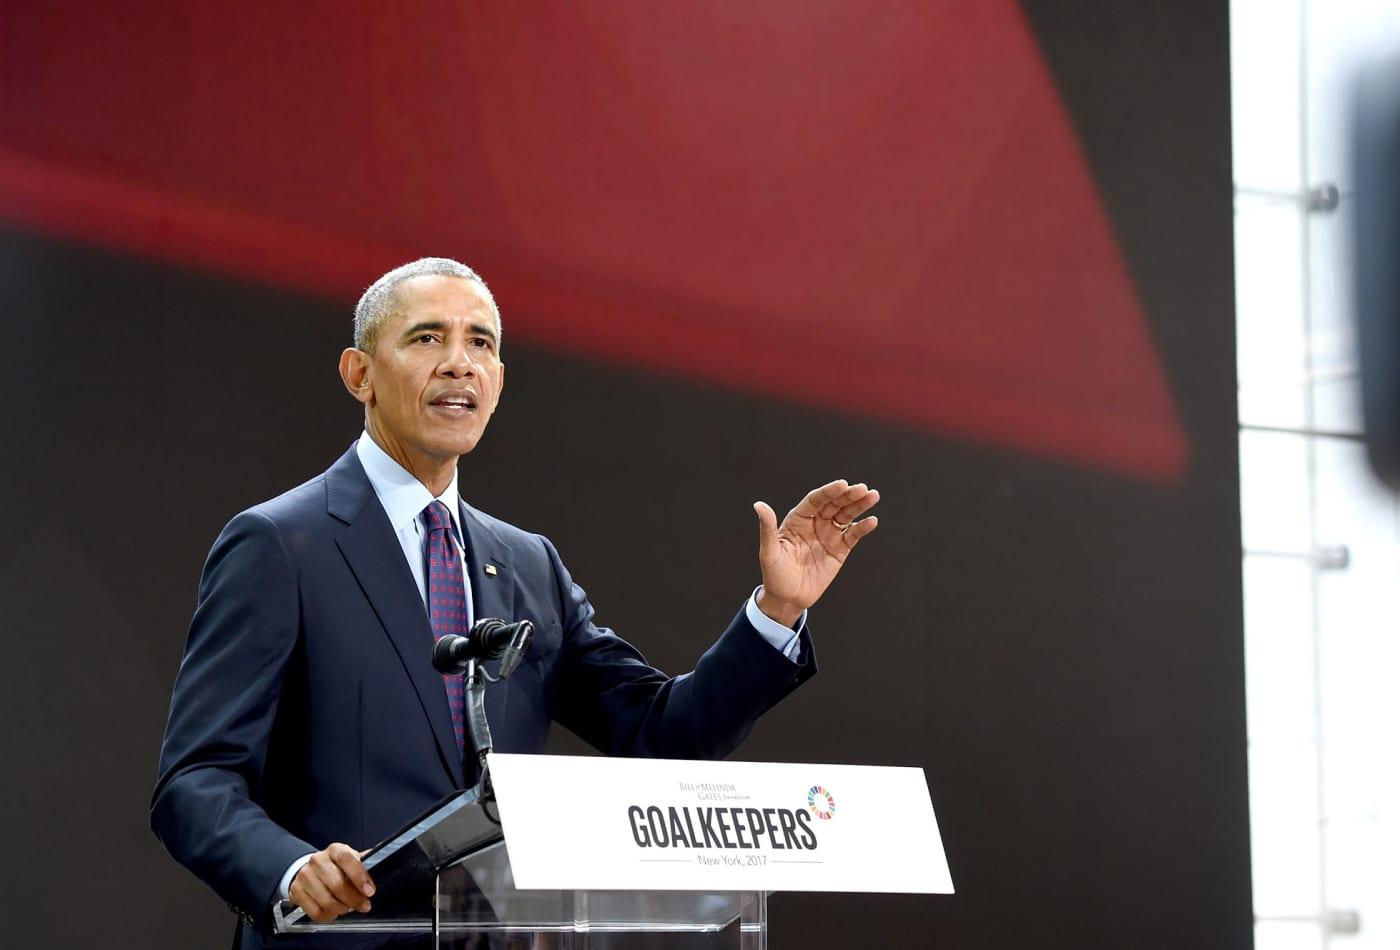 obama mp3 speech downloads